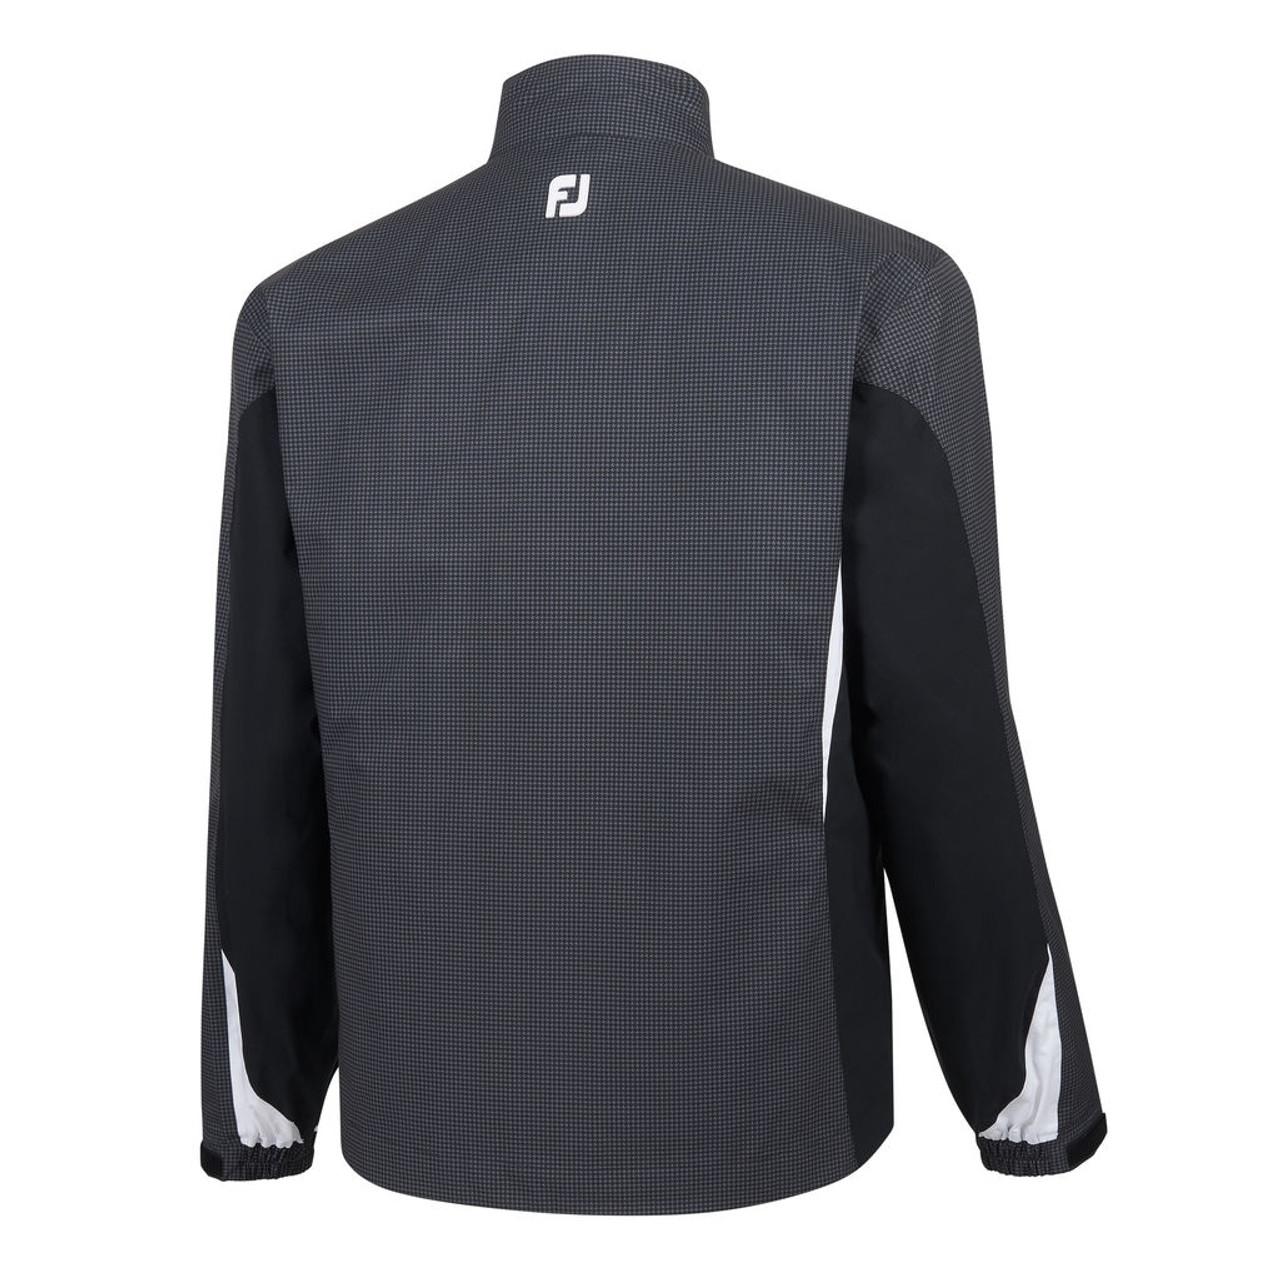 FootJoy FJ Hydrolite Rain Jacket - Charcoal / Black Houndstooth (23774)